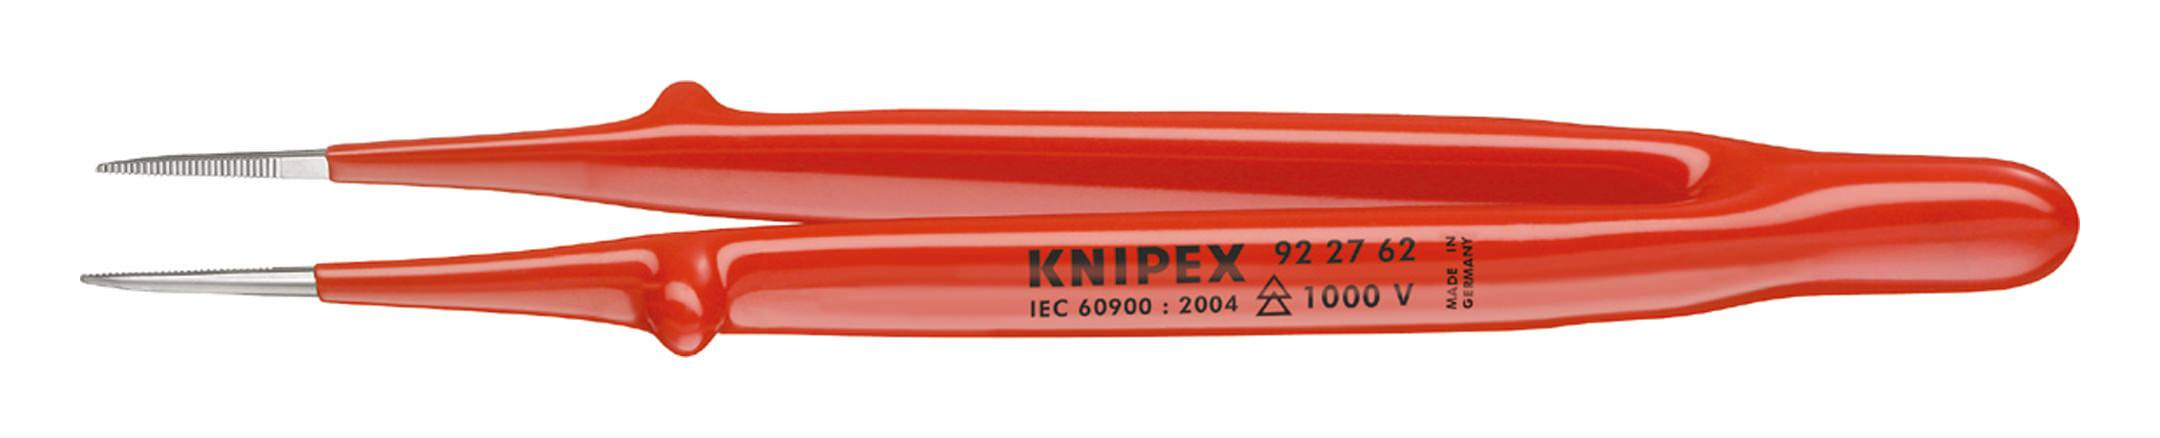 Knipex Präzisions-Pinzette 150mm VDE - 92 27 62